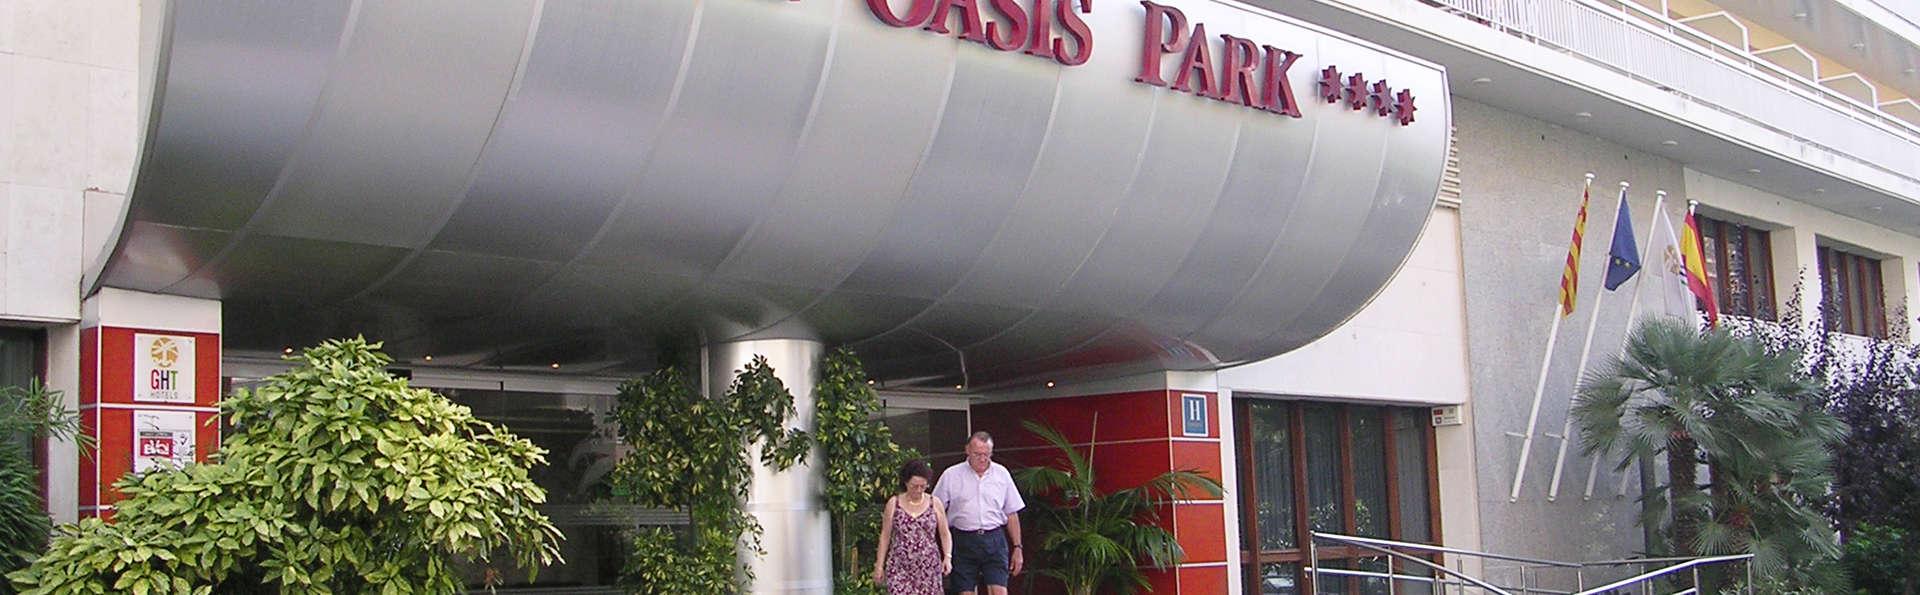 Hotel GHT Oasis Park & Spa - GHT Hotels - EDIT_2_Fachada.jpg